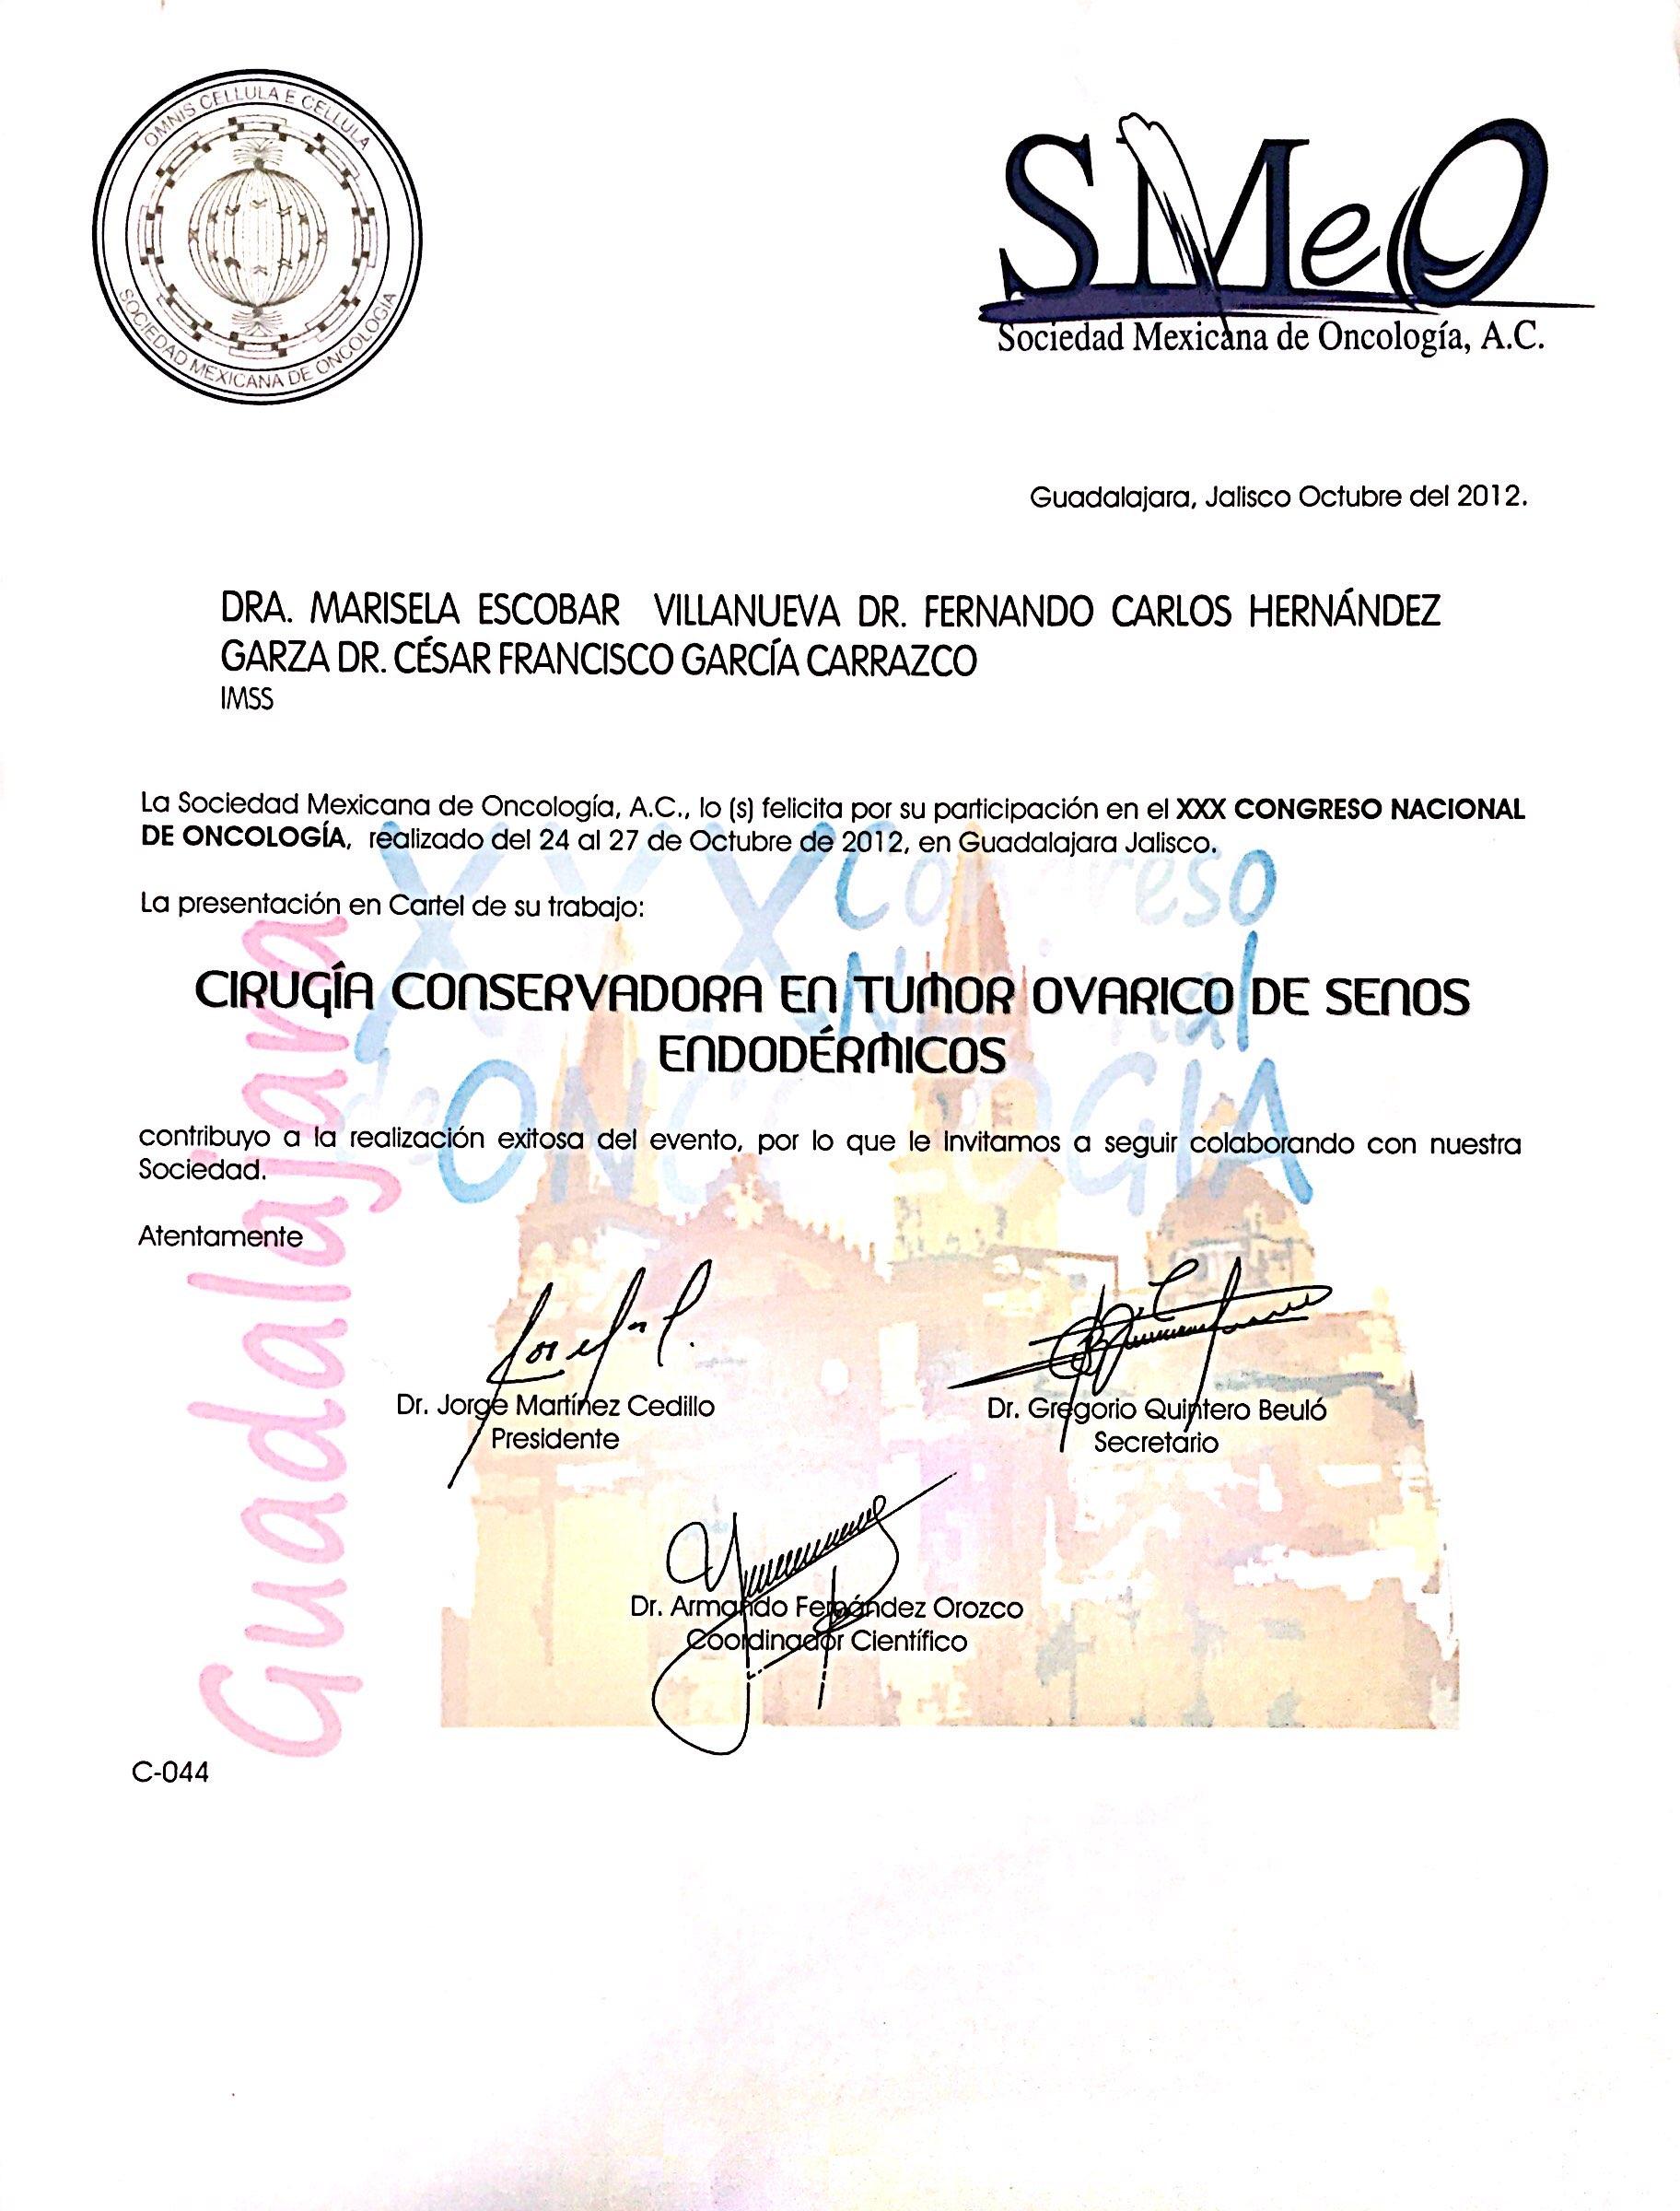 Nuevo doc 2018-02-20 11.21.39_18